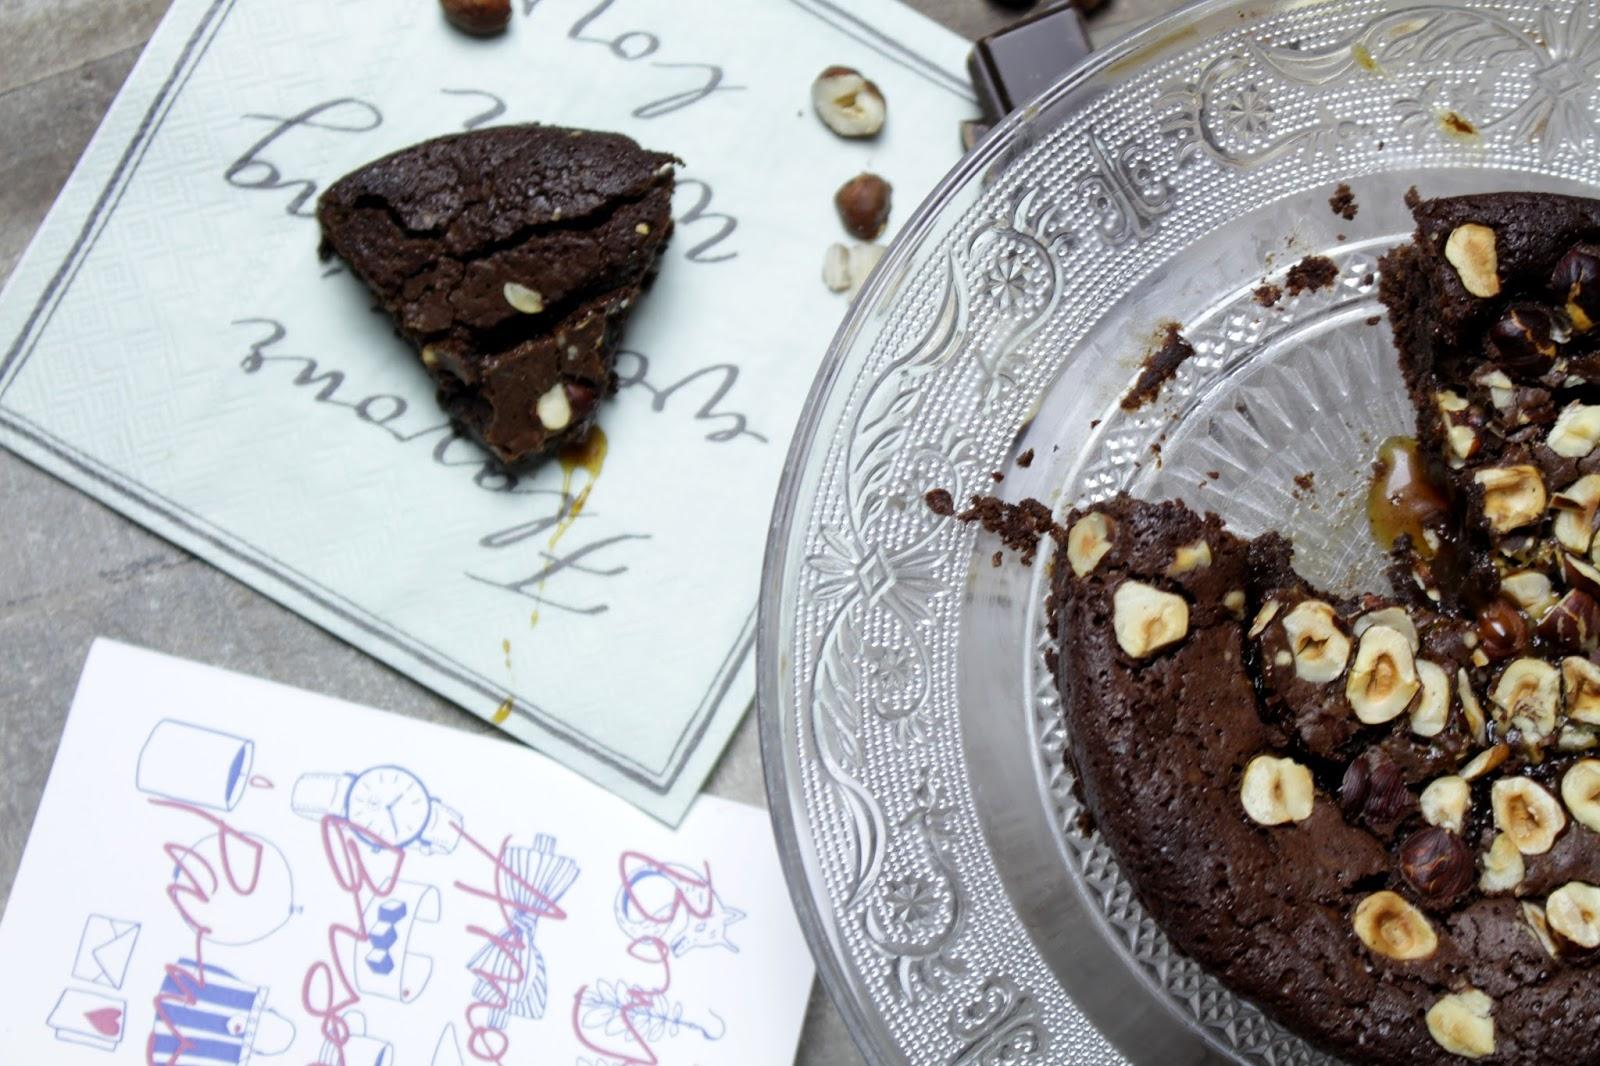 Gâteau Choco Noisettes & Caramel Beurre Salé